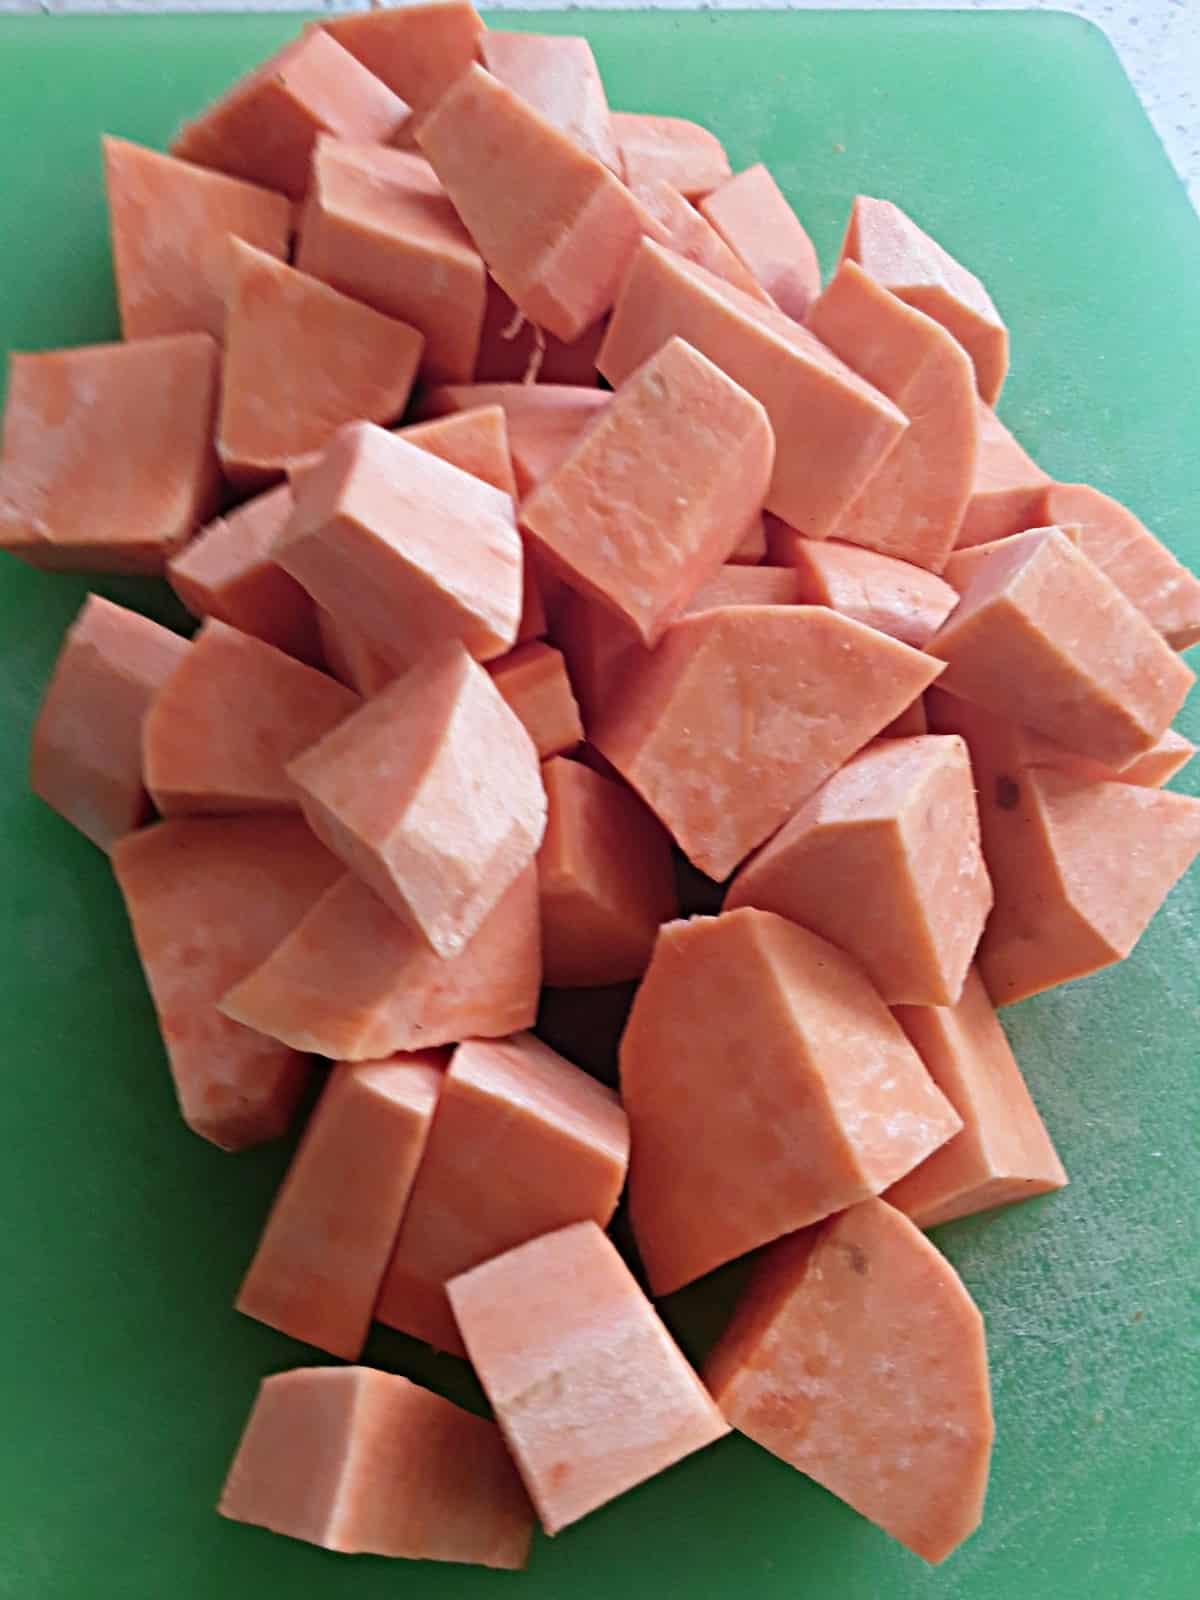 Peeled and chopped sweet potatoes on green cutting board.